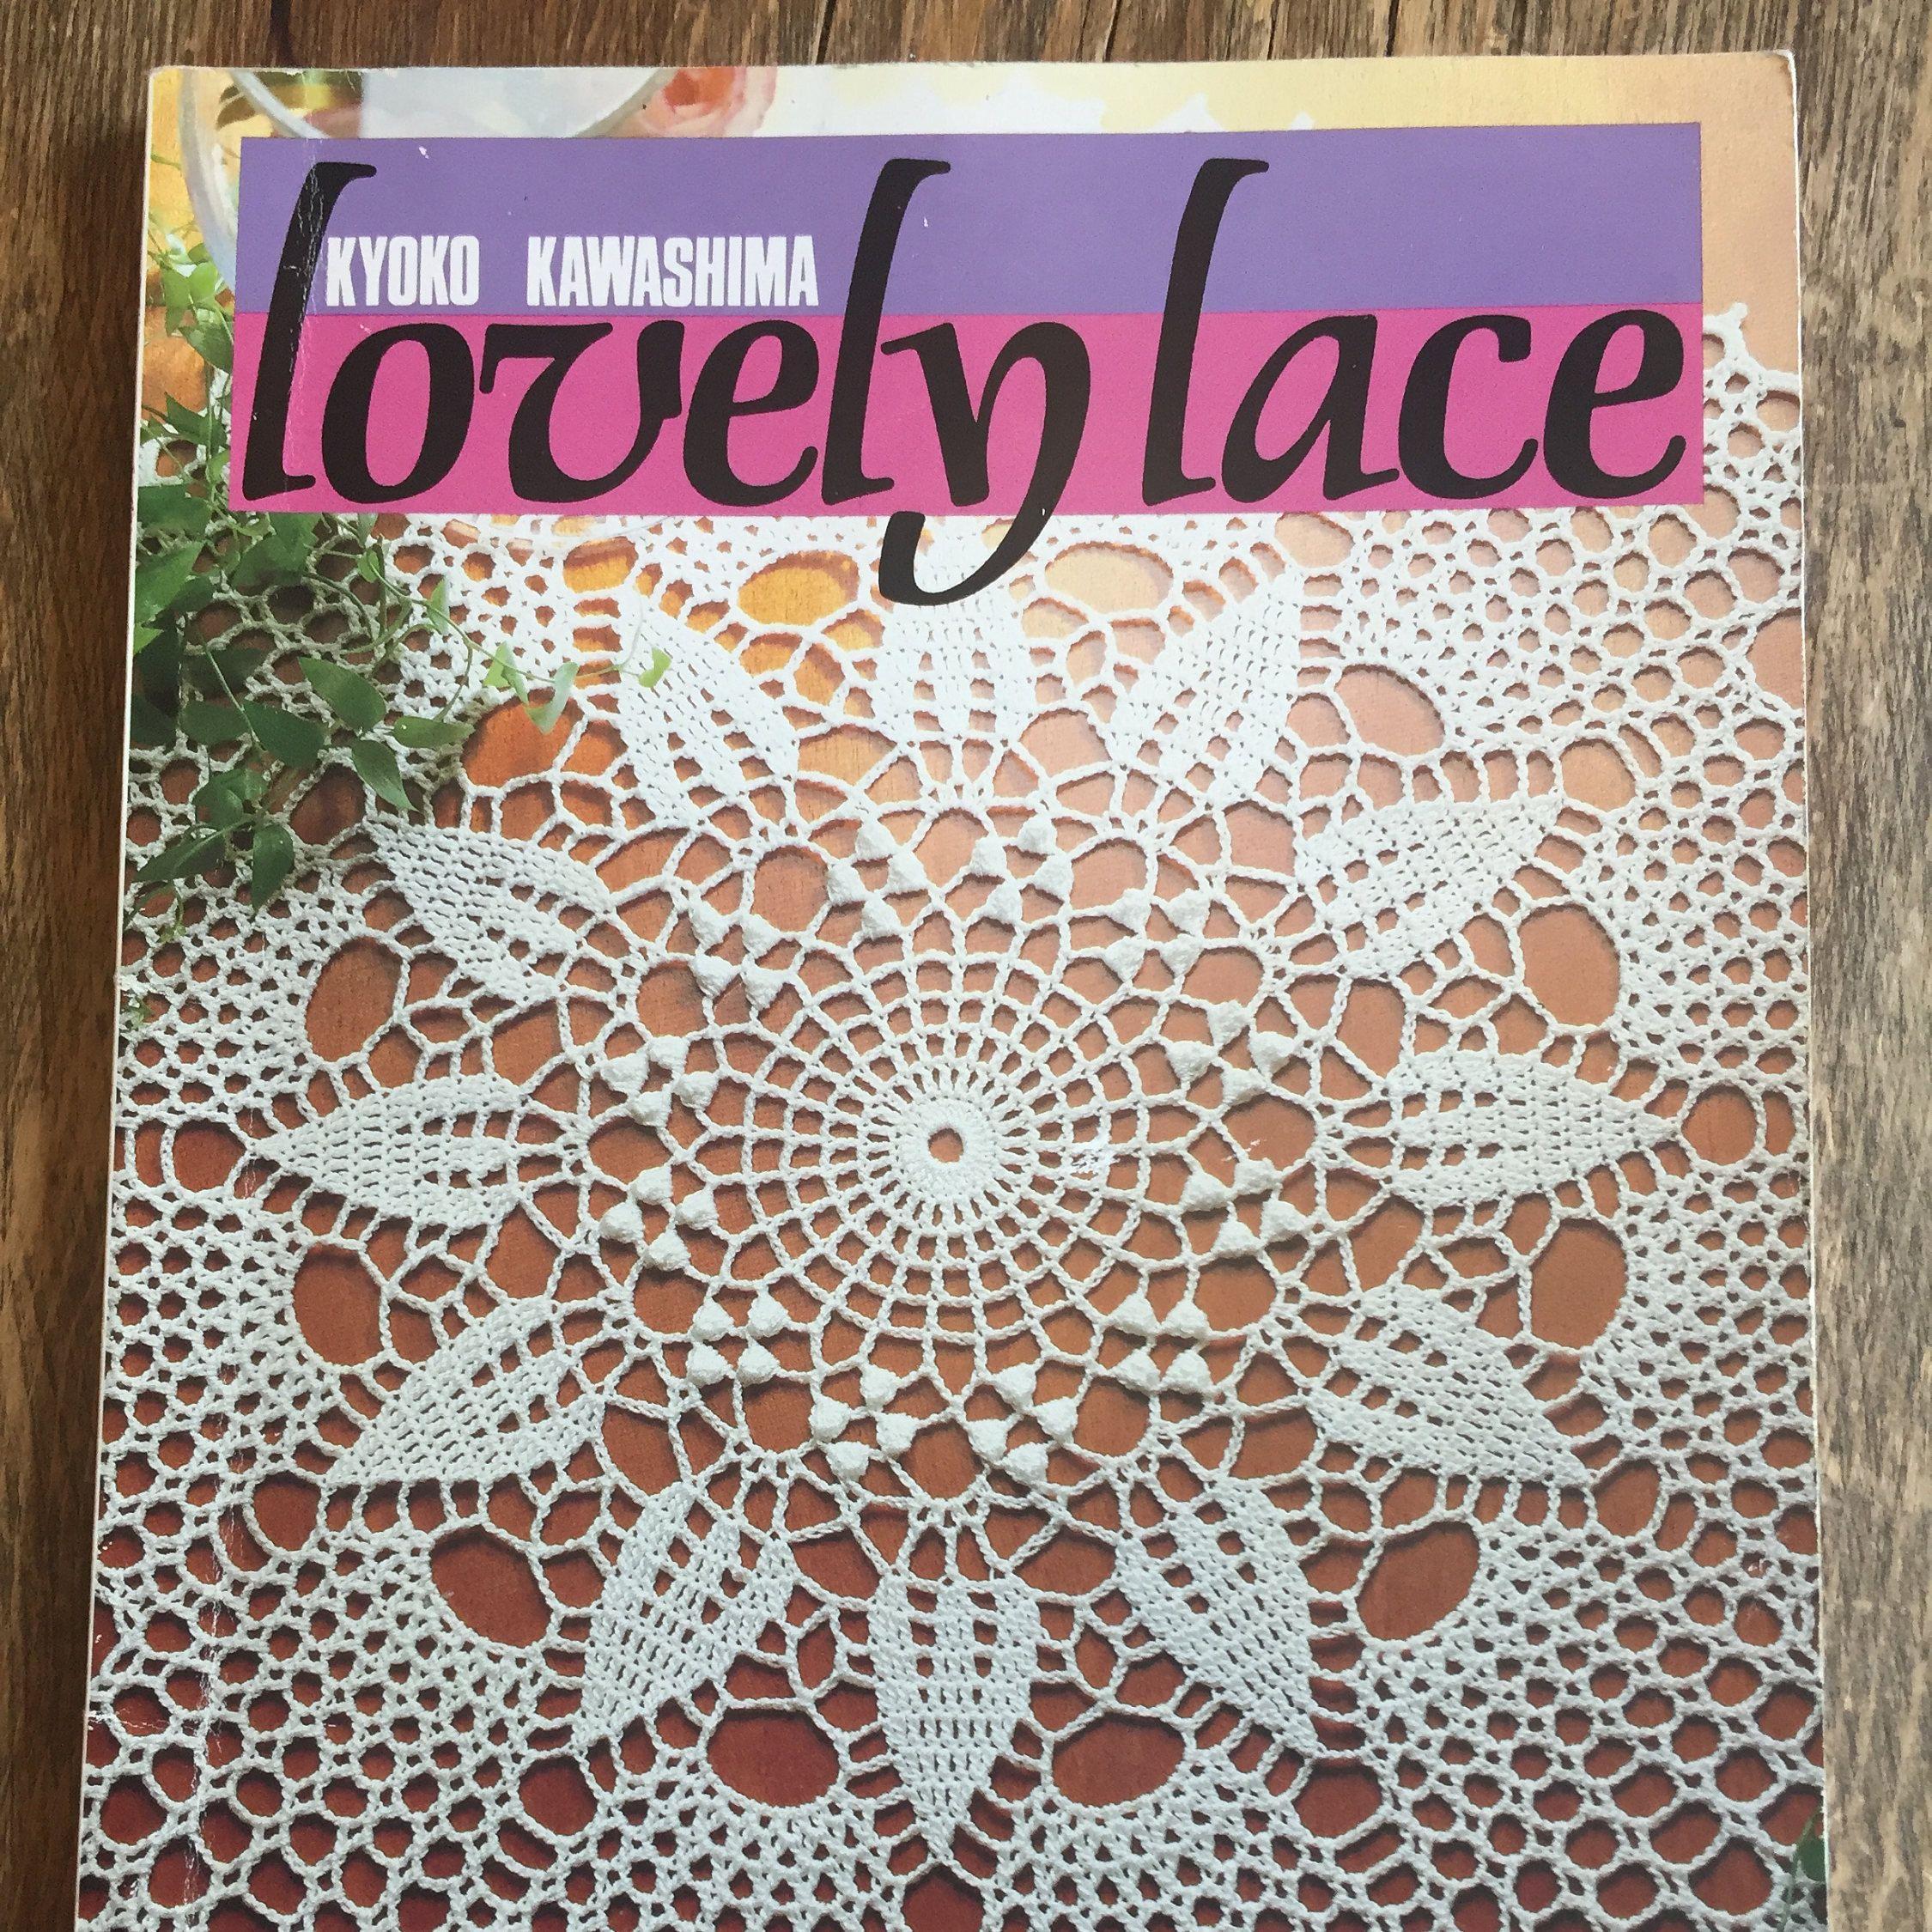 Kyoko Kawashima LOVELY LACE ~ Crochet Pattern Book ~ 1984 SC from Nihon  Vogue by StitchinVintage